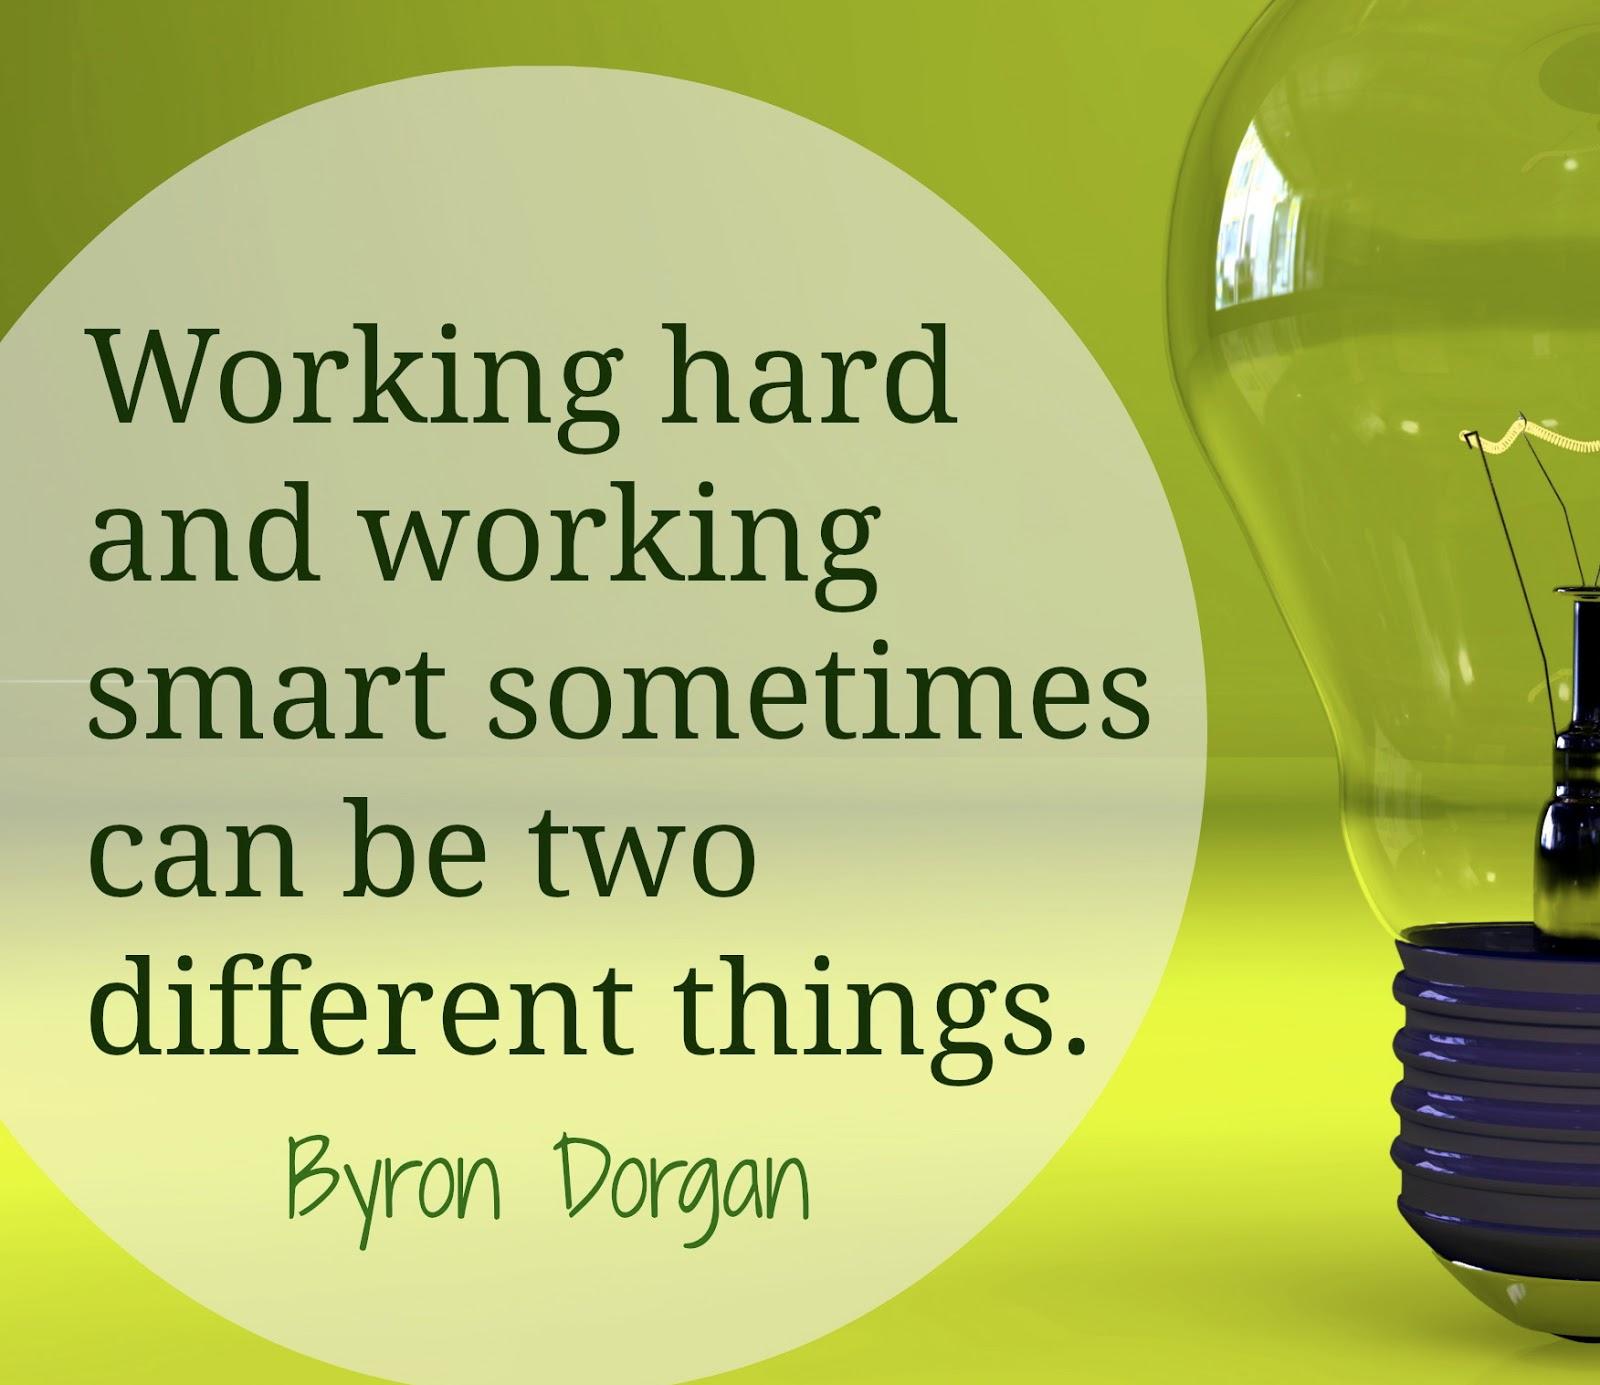 Work Smarter Not Harder Quote: Peak Incorporated: Working Smart